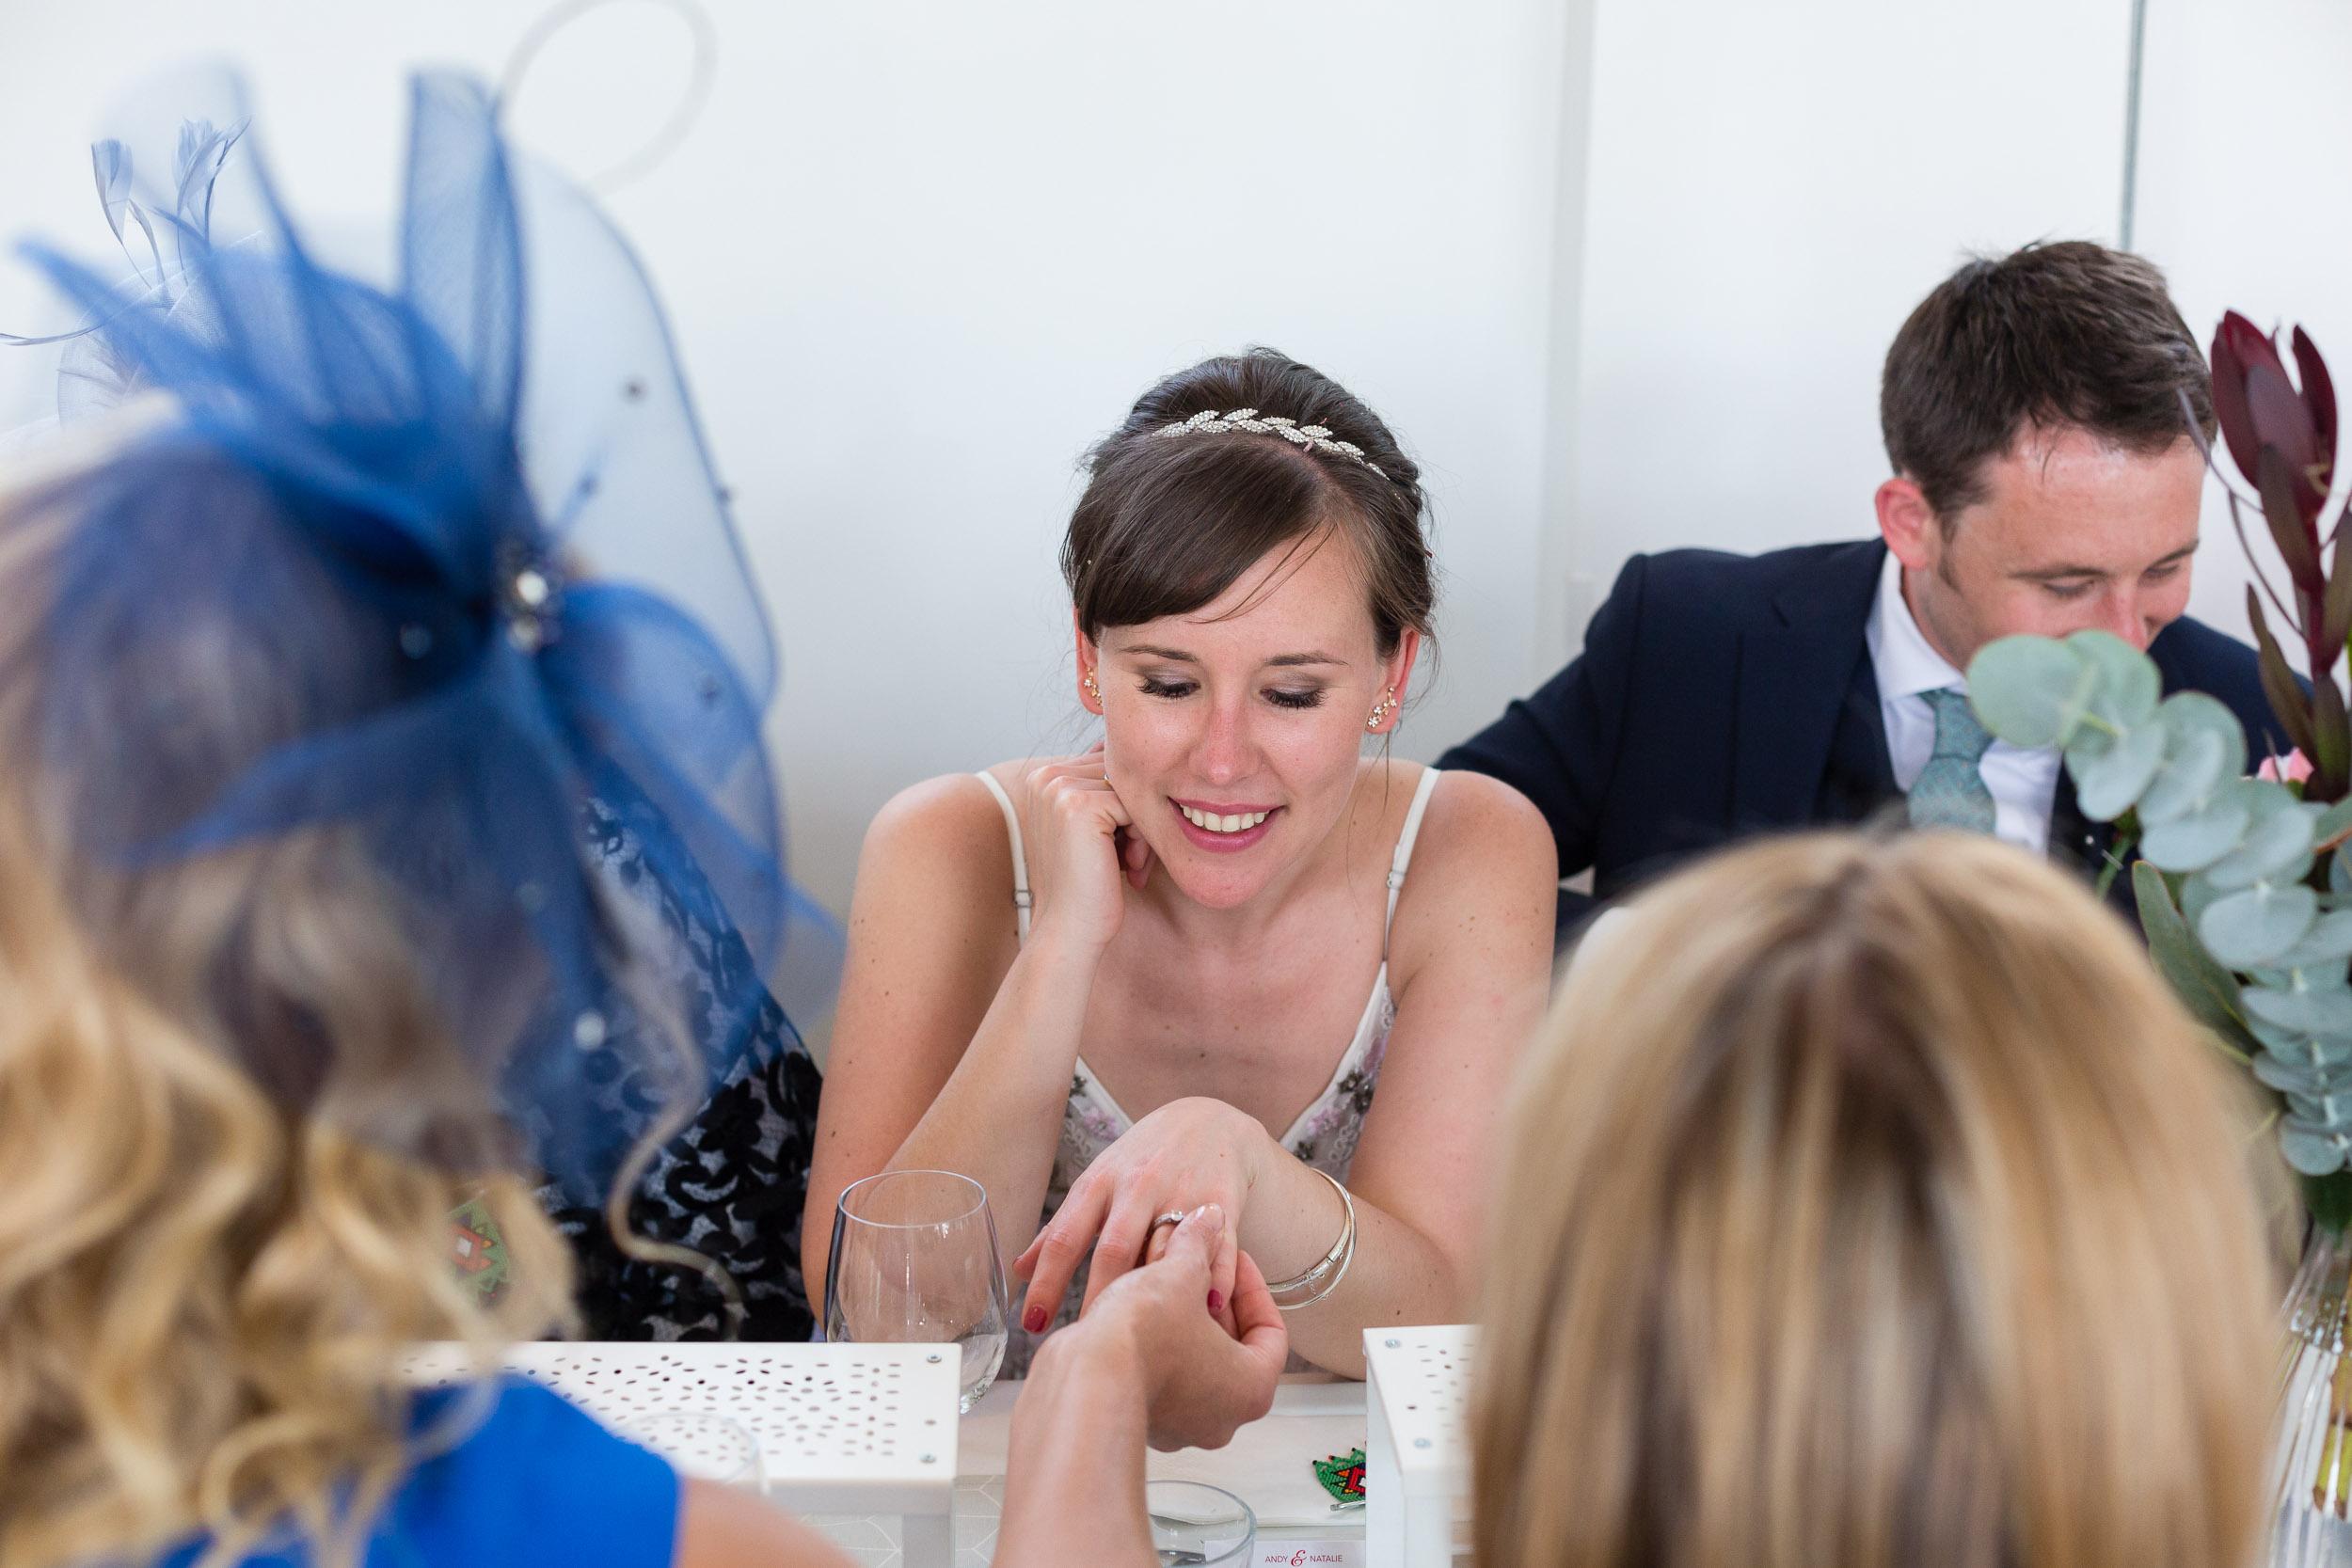 brockwell-lido-brixton-herne-hill-wedding-306.jpg